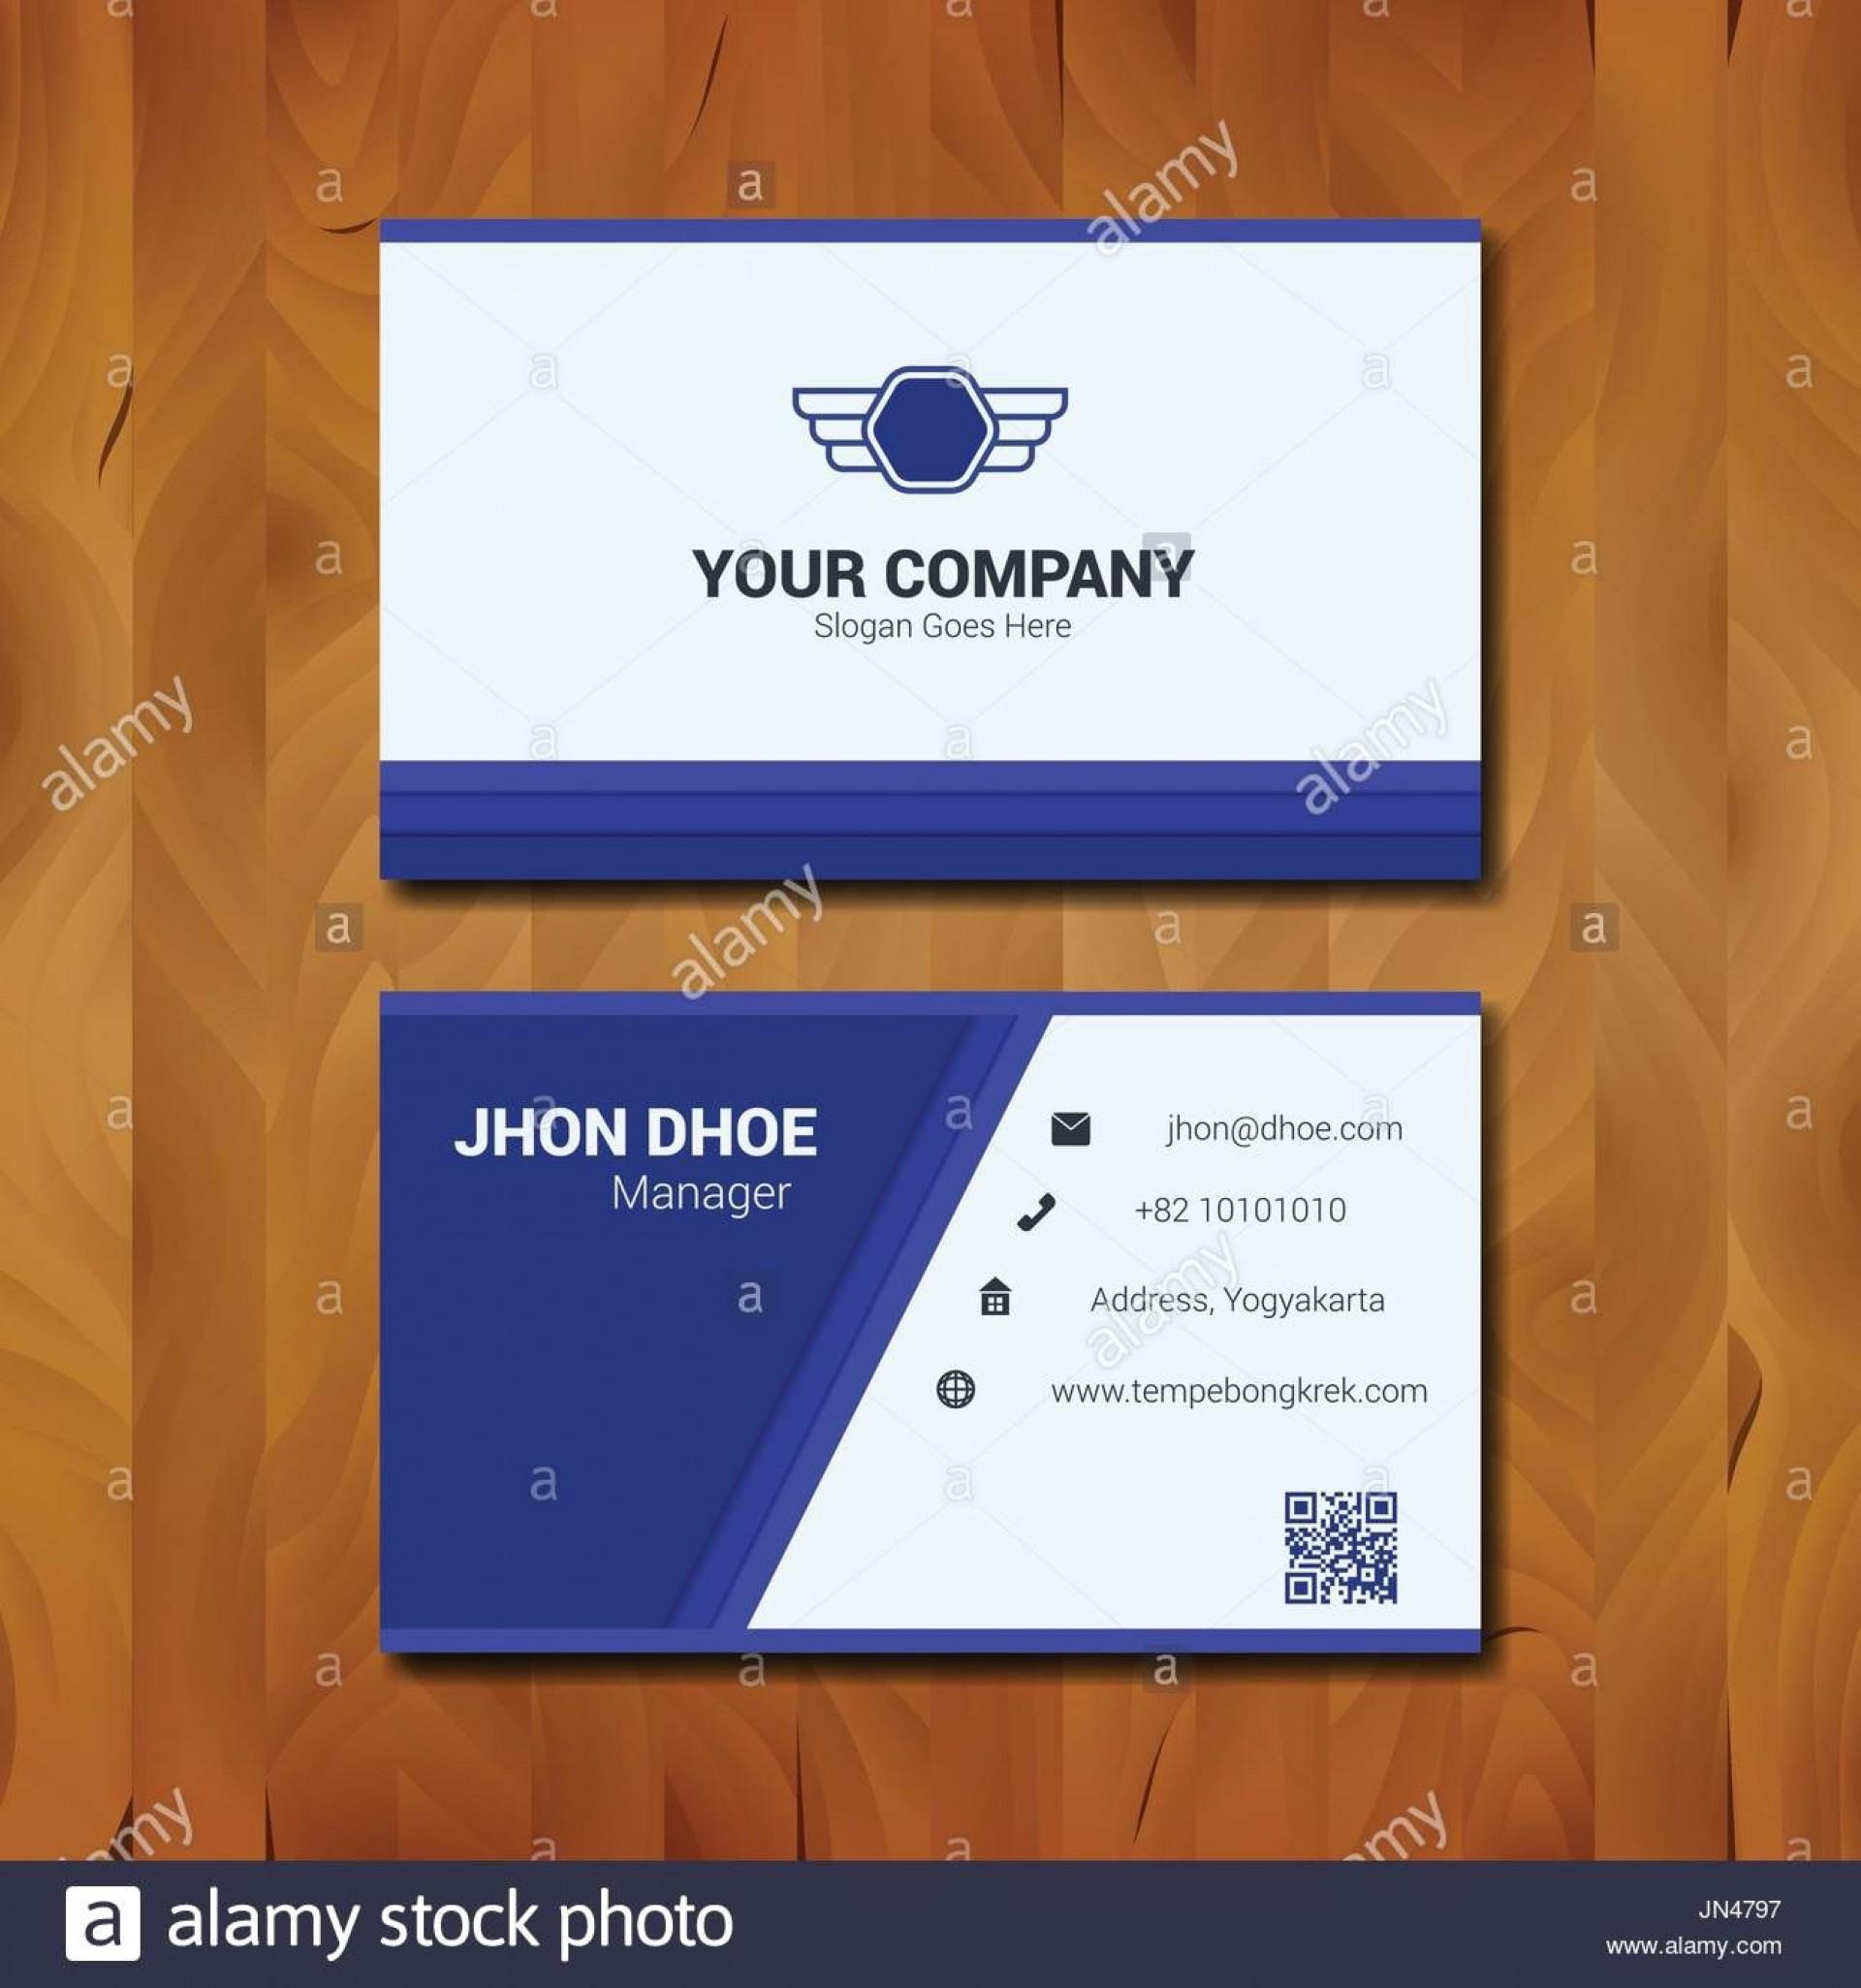 010 Fantastic Simple Visiting Card Design High Definition  Busines Idea Psd File Free Download1920